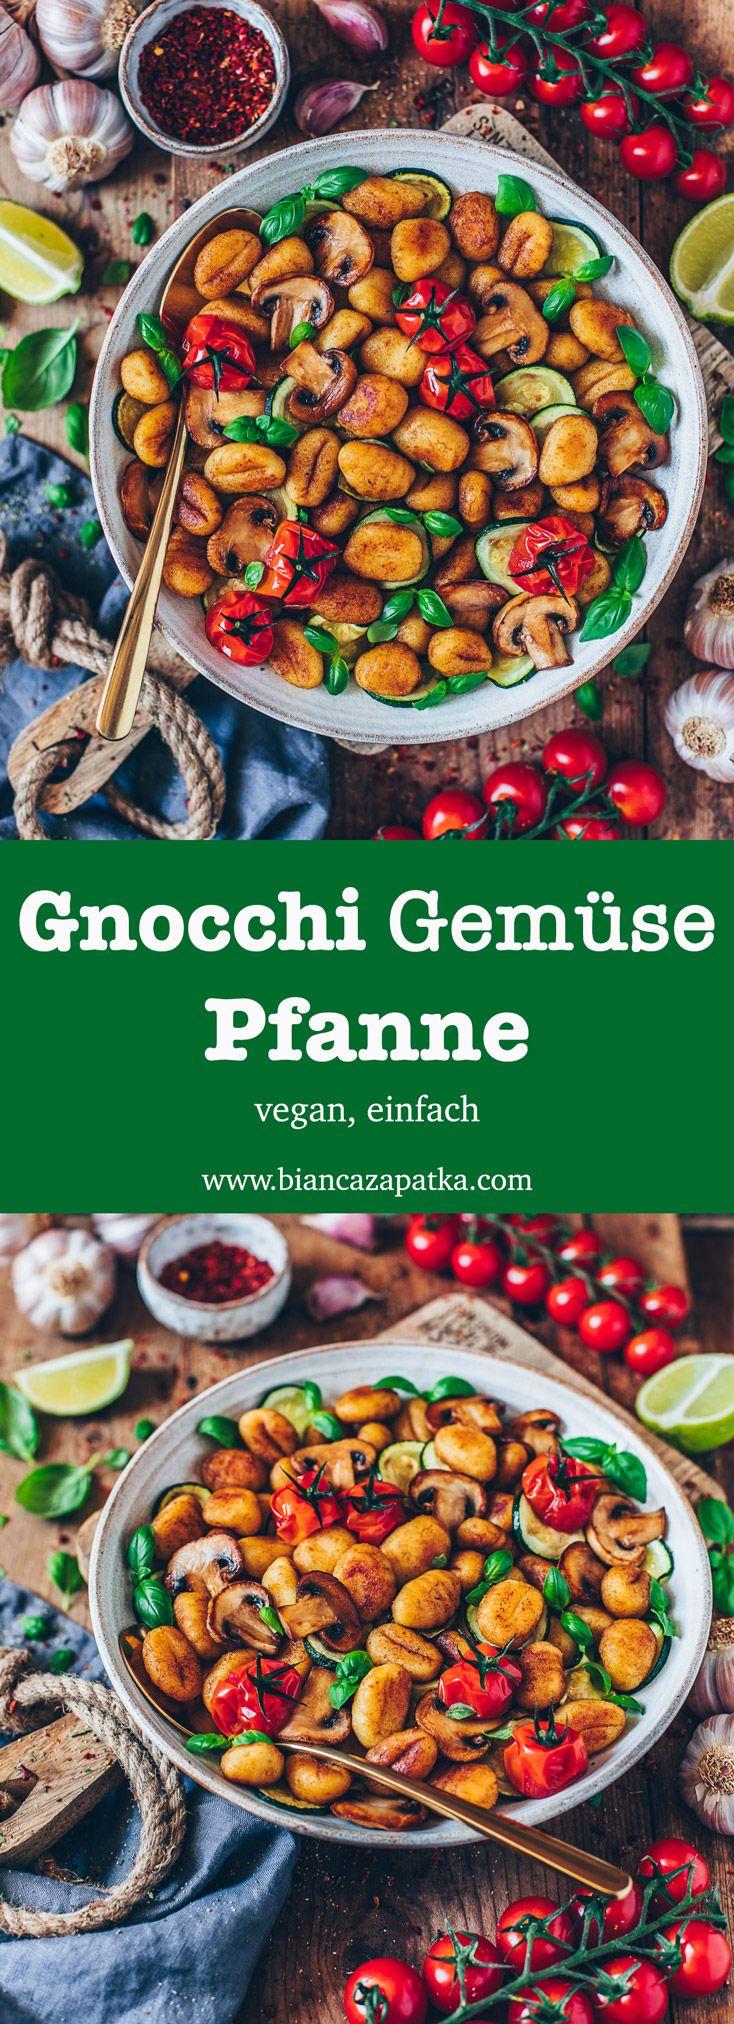 Gnocchi-Gemüse-Pfanne (vegan #vejetaryentarifleri